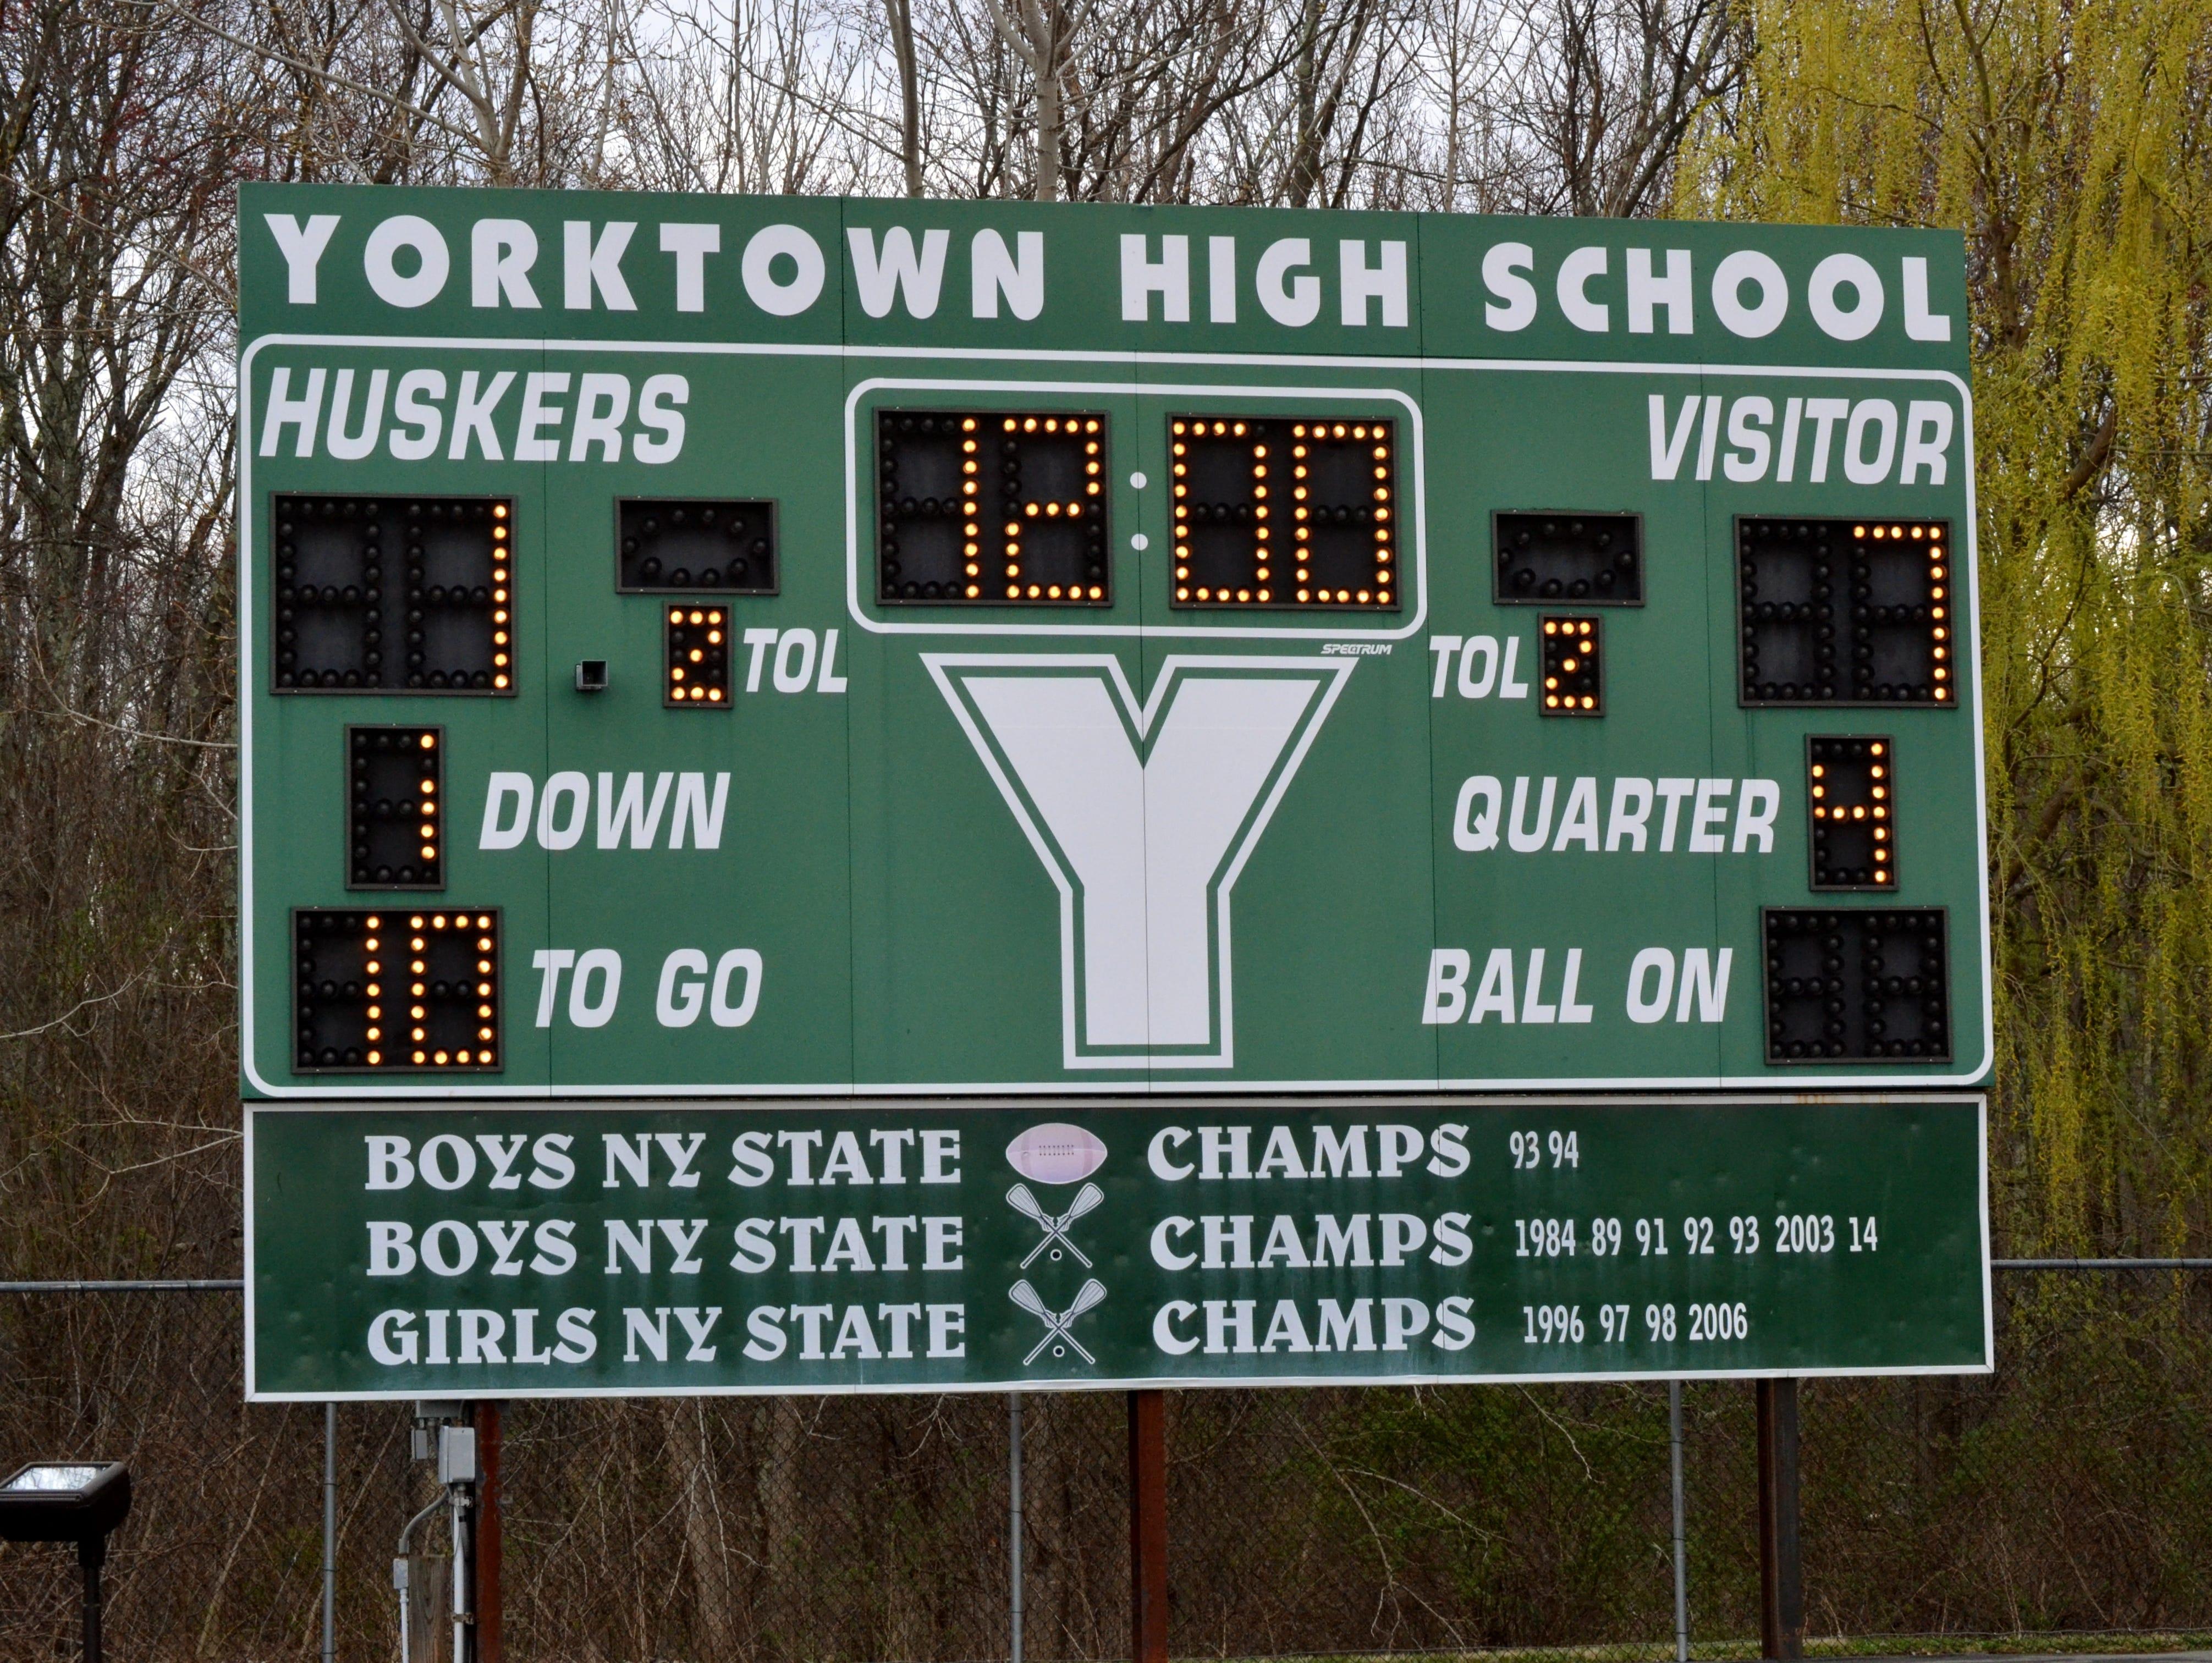 Scoreboard at Yorktown High School.